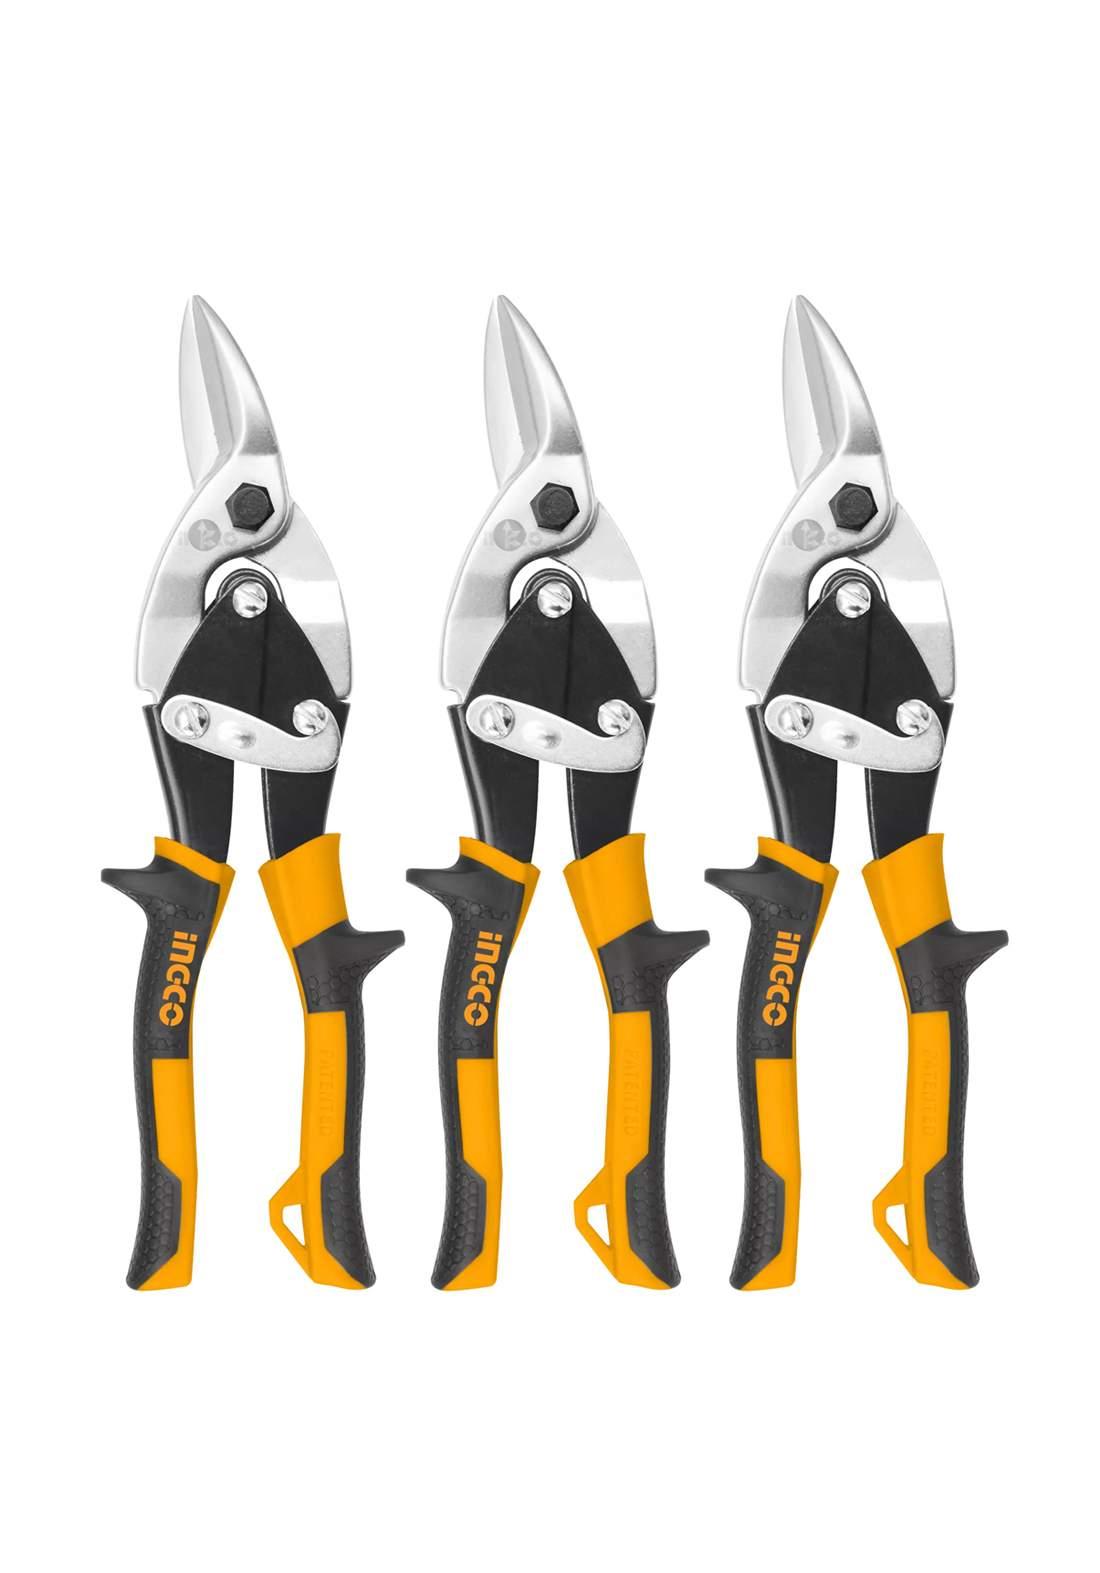 Ingco HTSNk0110 Cutting Tin Snips Set 3 Pcs 300 mm مقص بليت